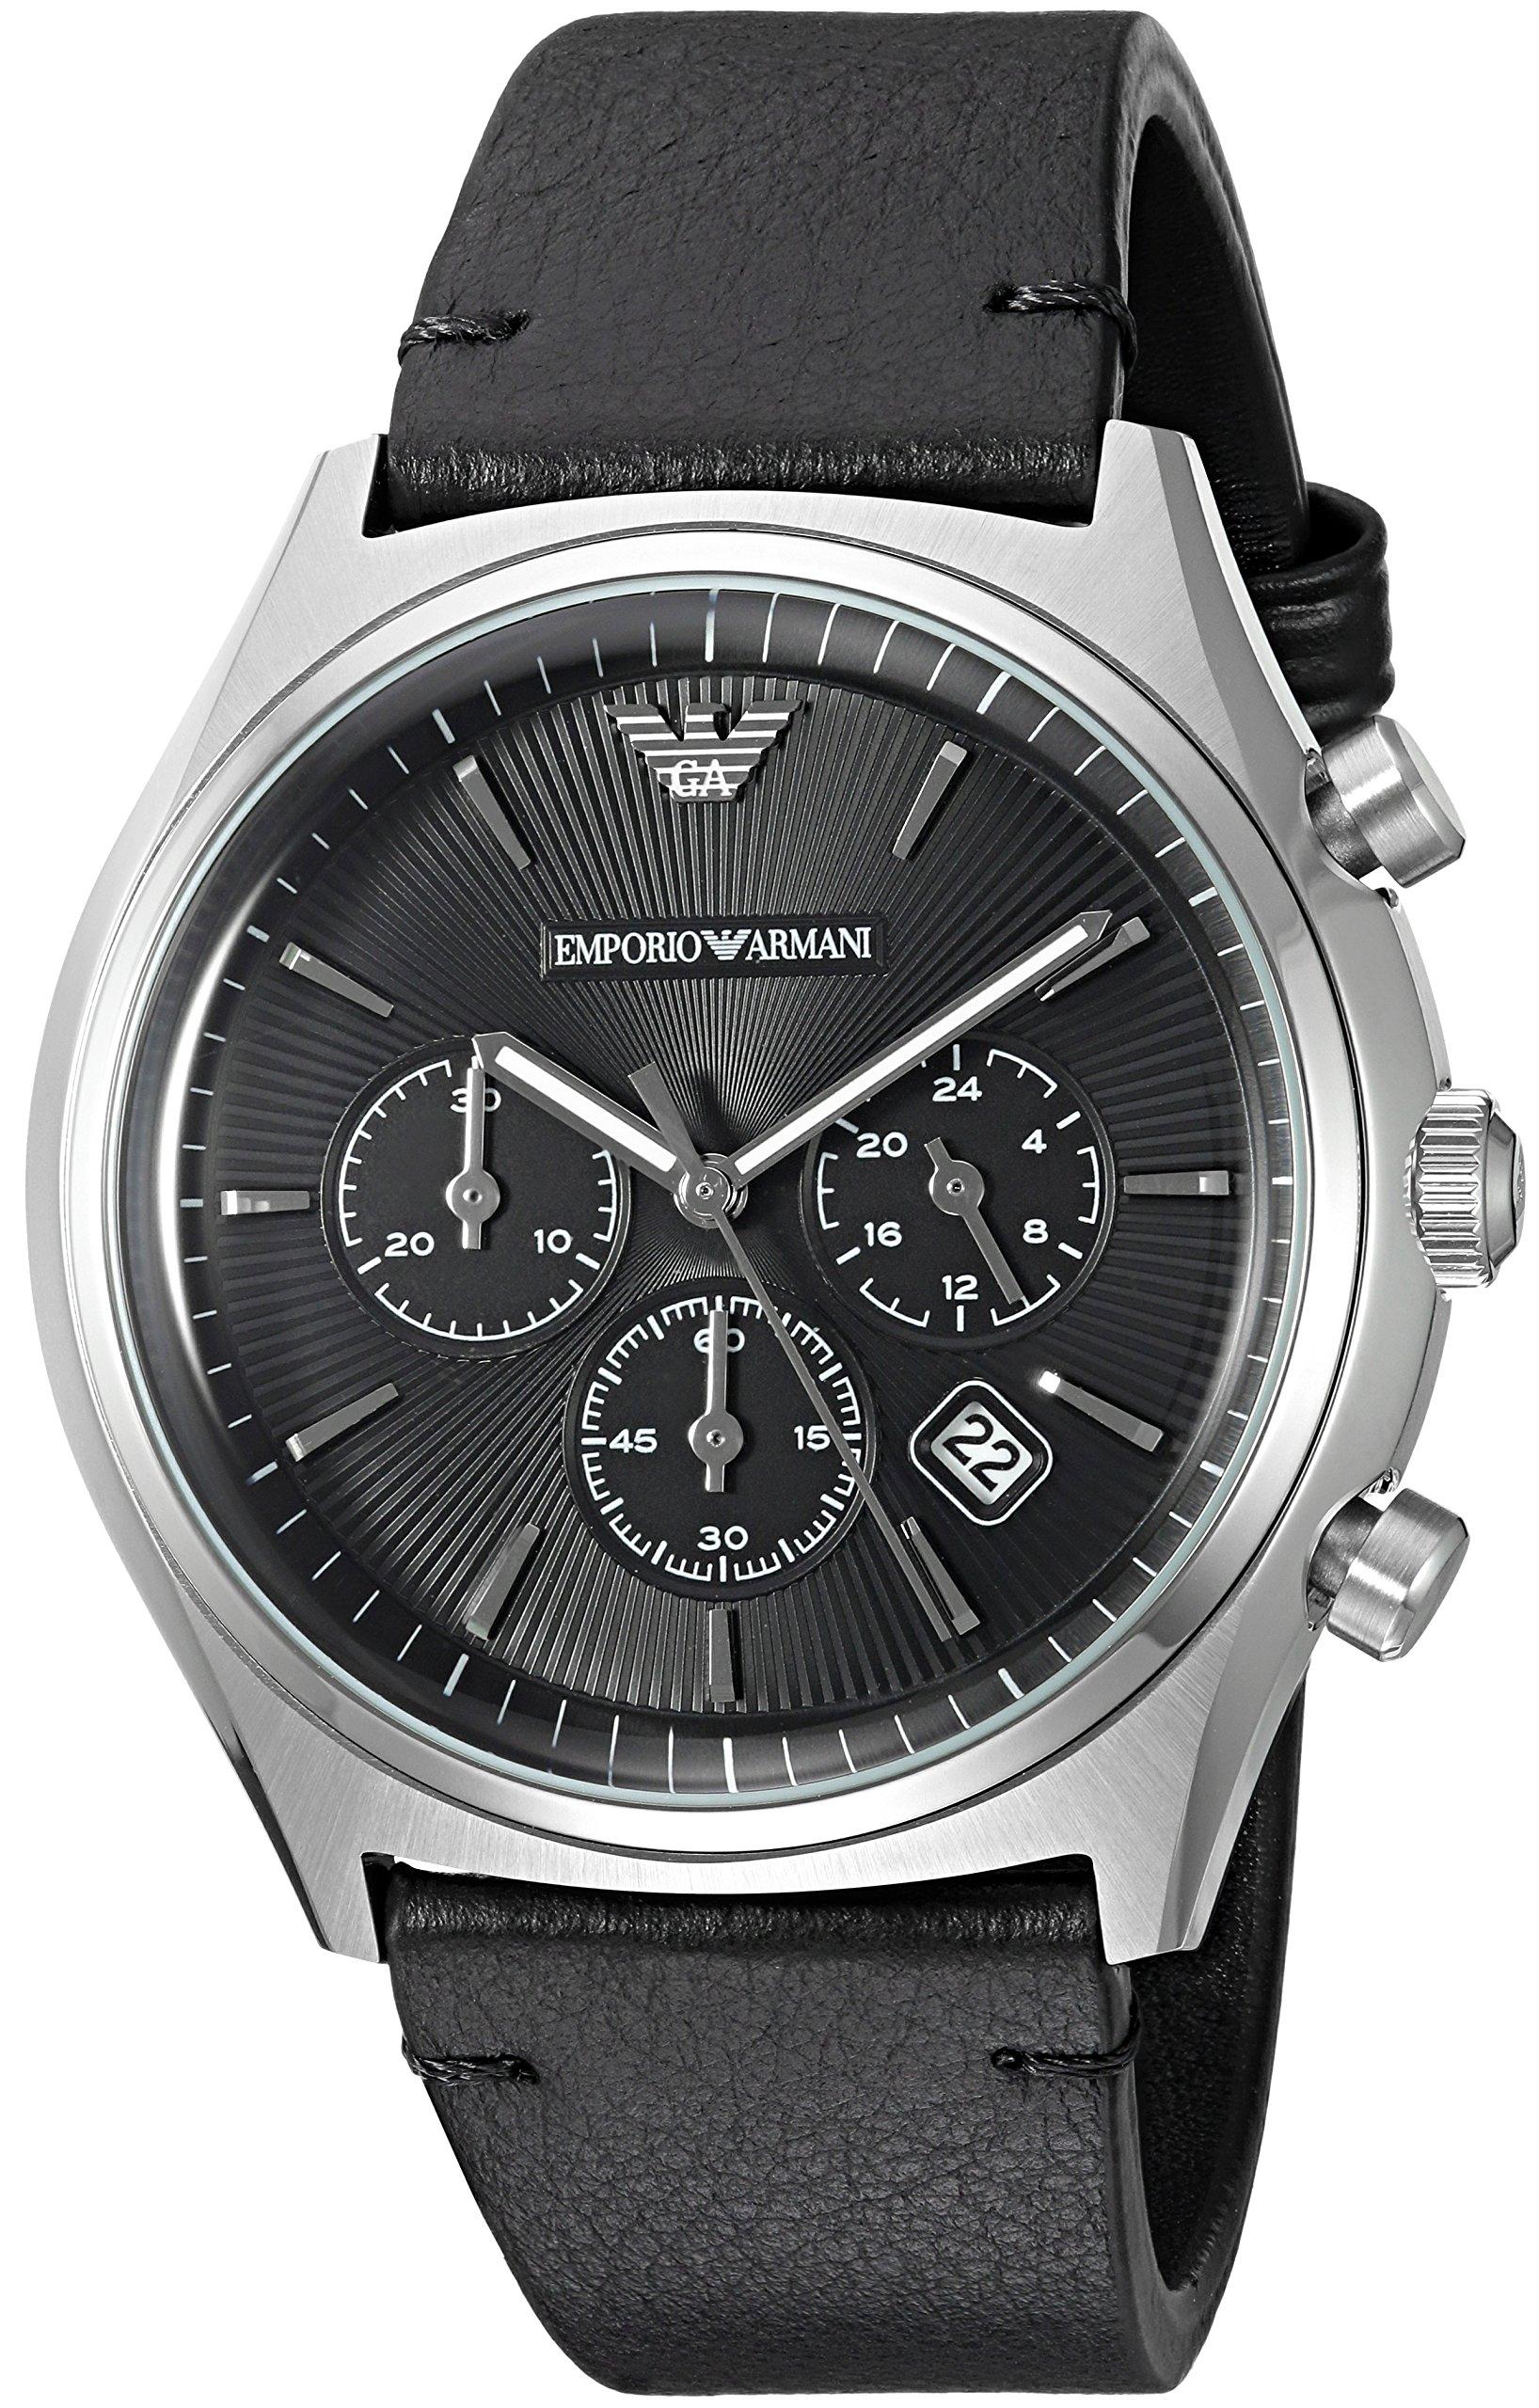 Reloj Emporio Armani para Hombre AR1975